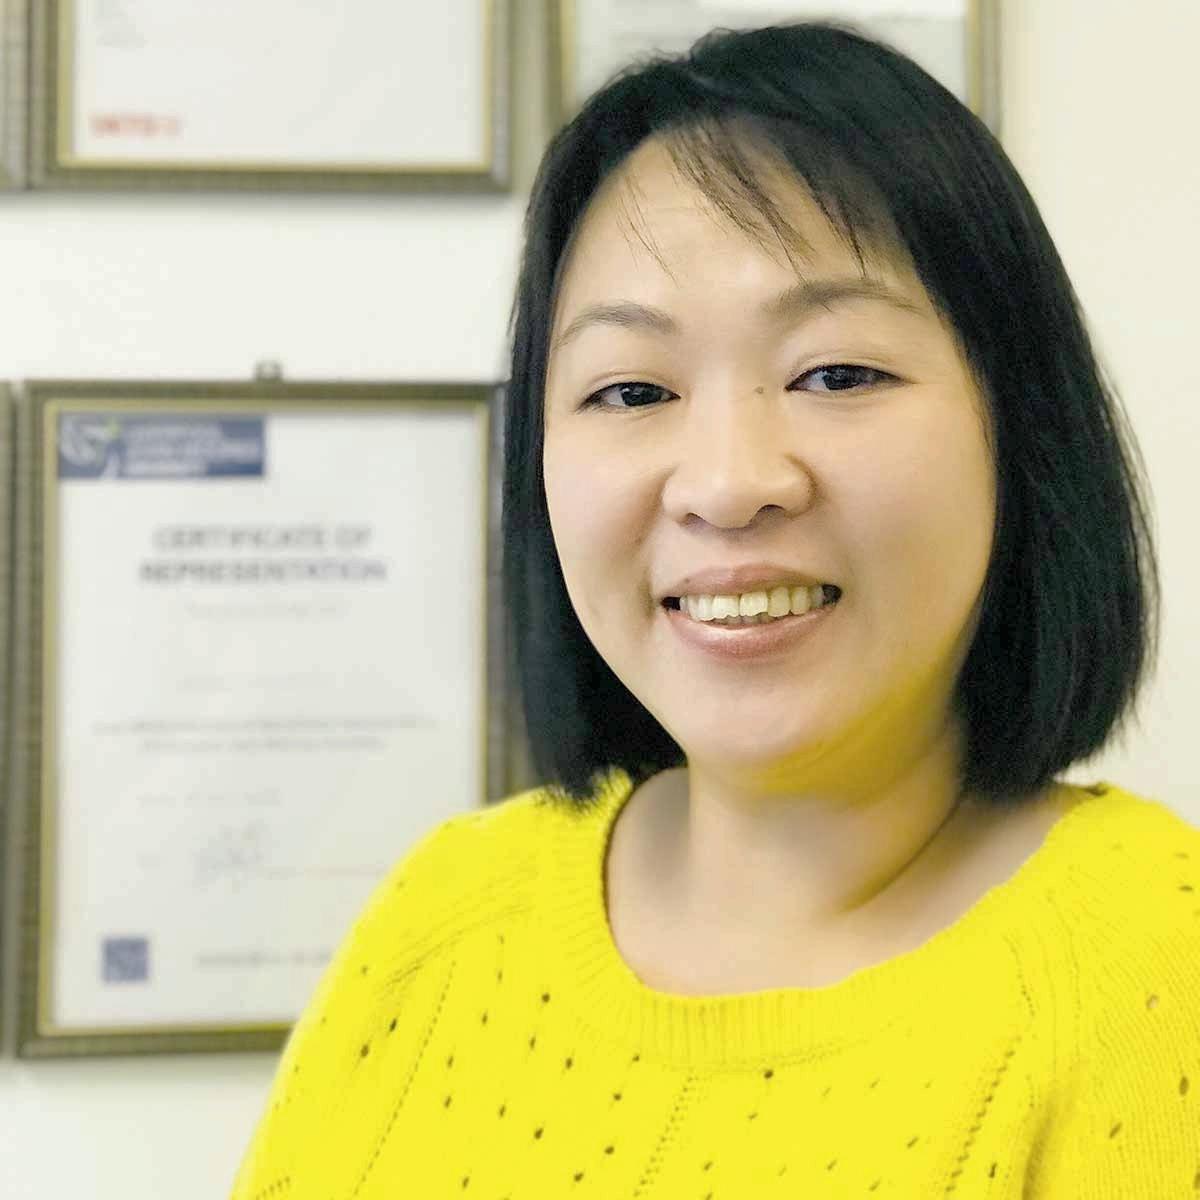 Name 1 - Mandarin - 12 years industry experience